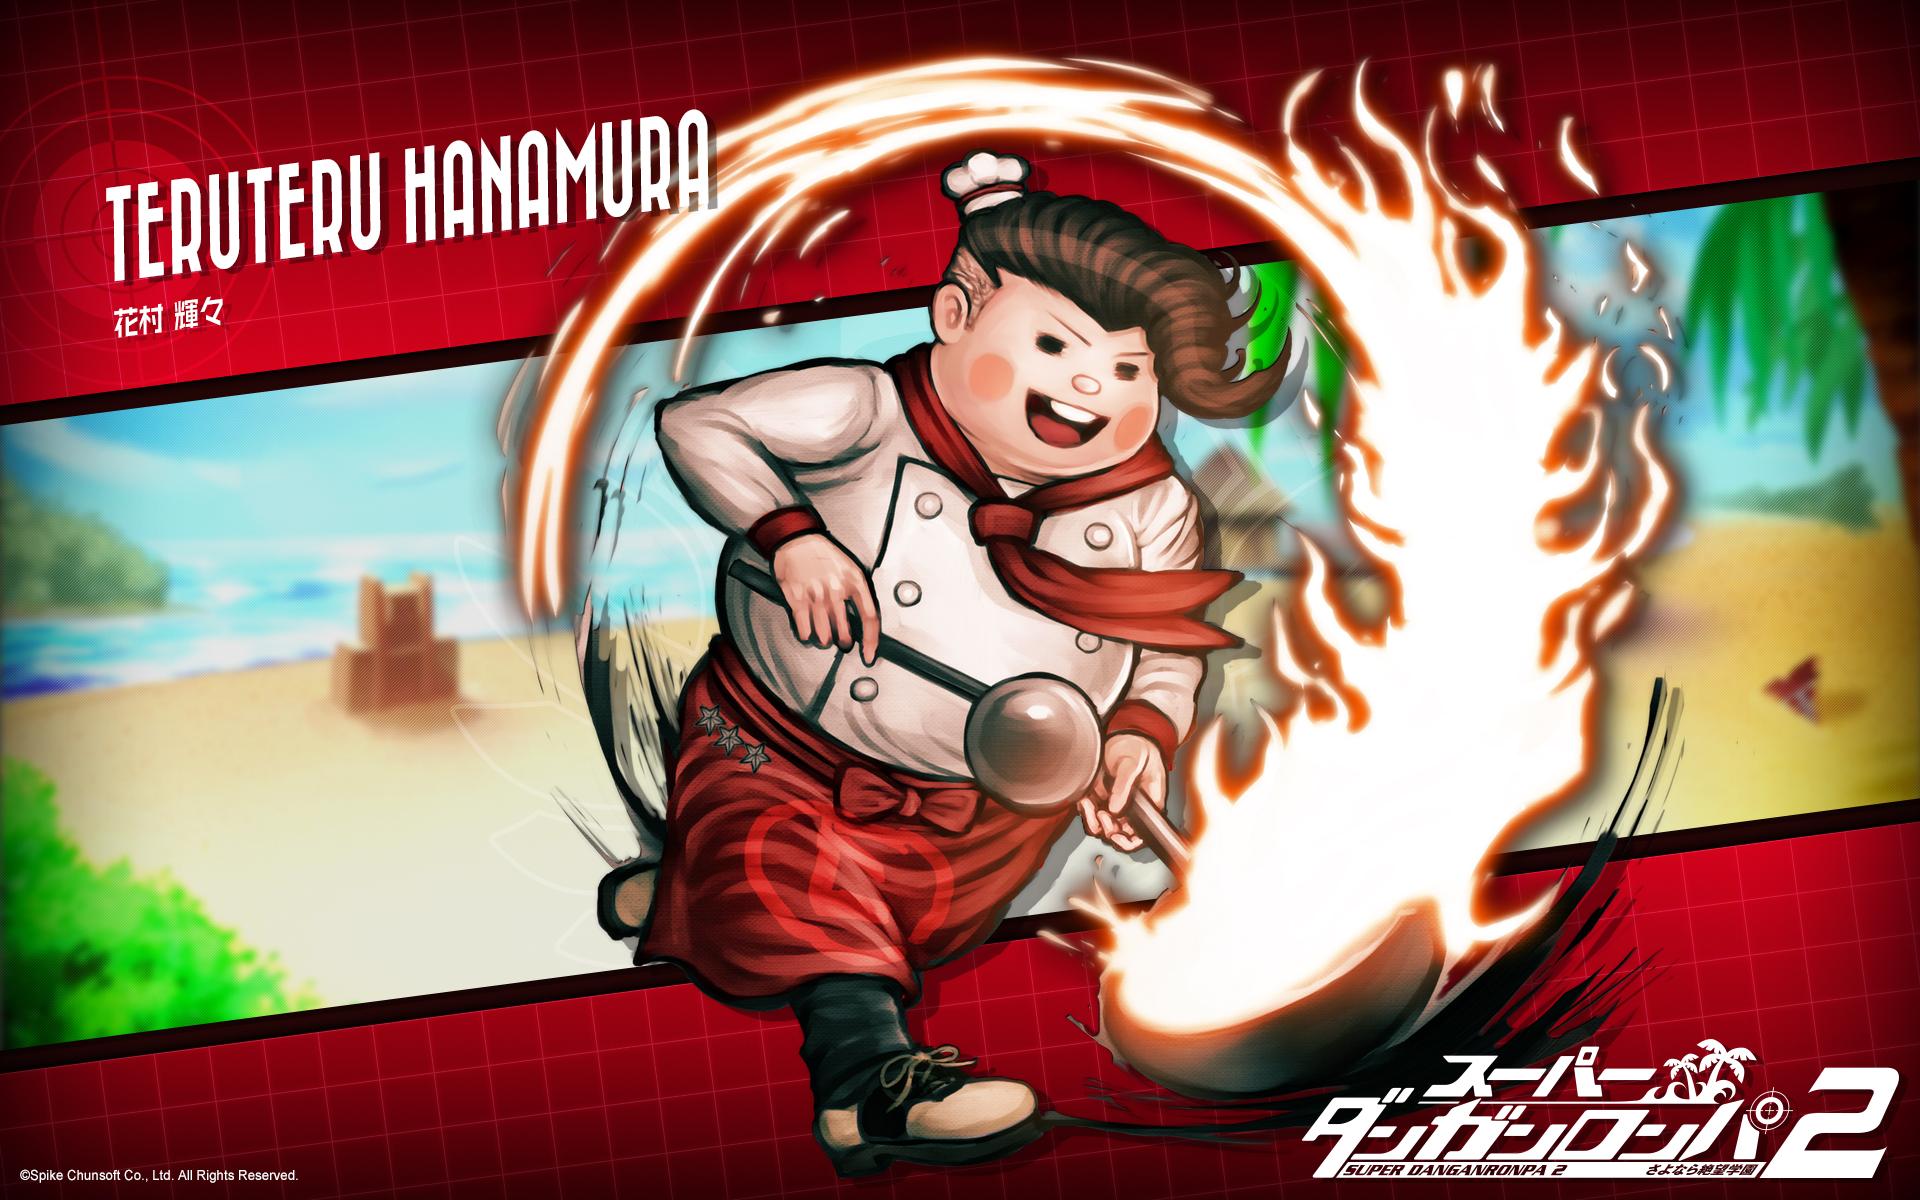 Hanamura Teruteru Super Danganronpa 2 Wallpaper 1663489